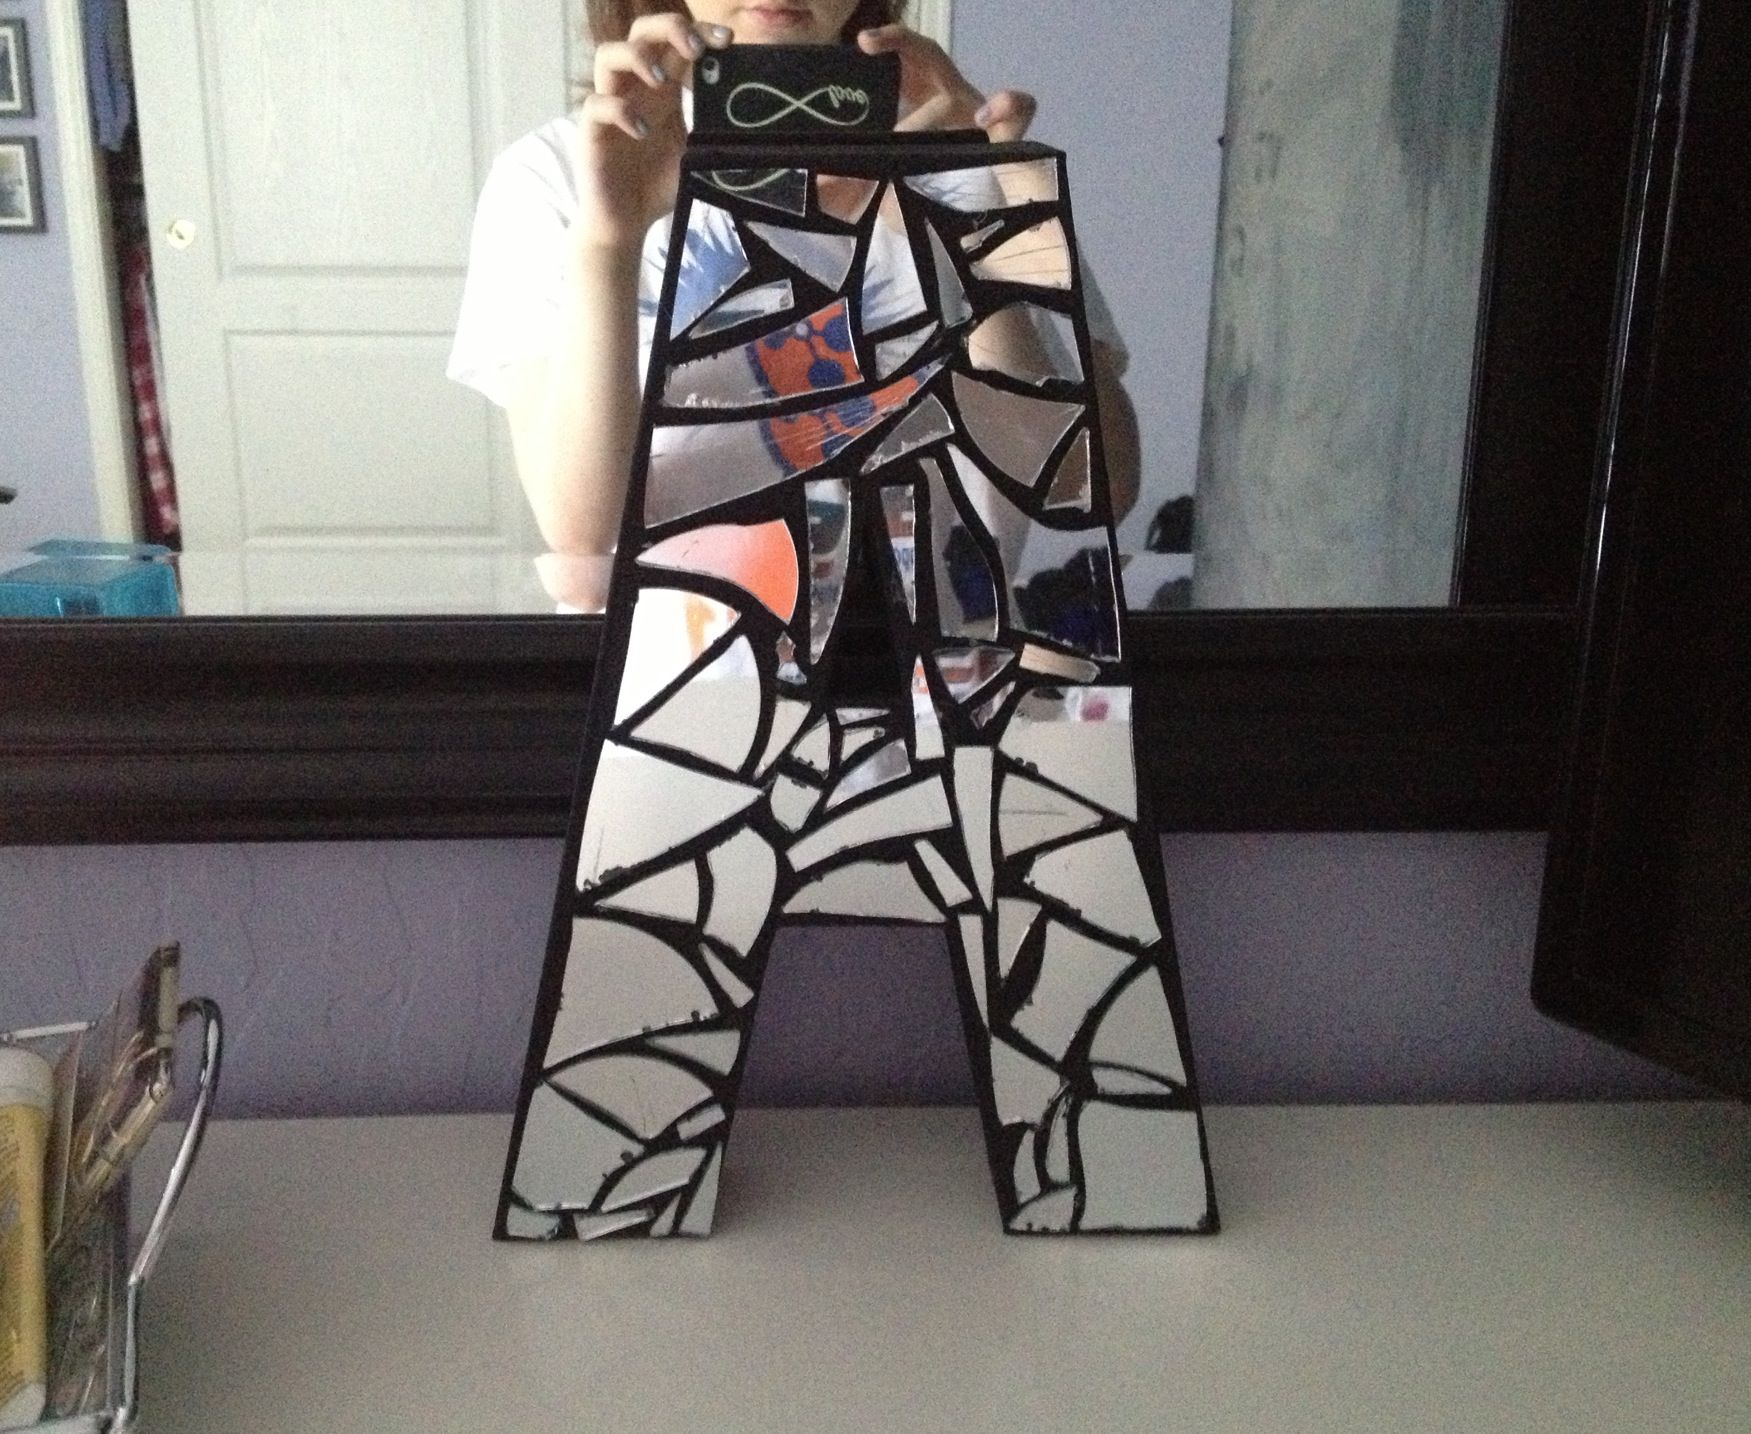 Pin By Alicia Arias On Craft Ideas Broken Mirror Projects Broken Mirror Art Broken Mirror Diy